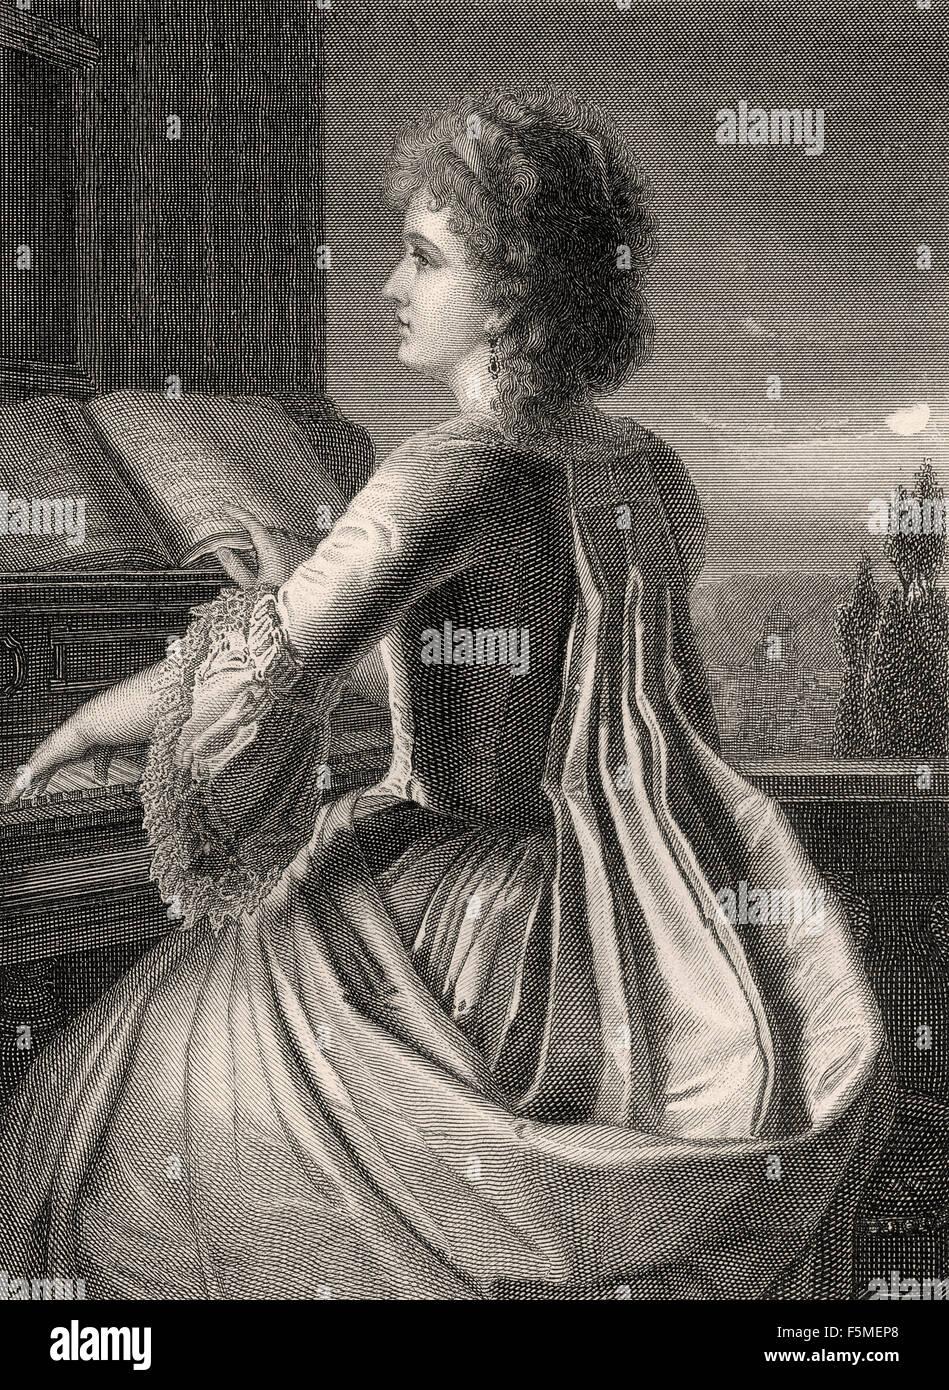 Anna Elizabeth Schoenemann, 1758-1817, financée 'Lili' of Johann Wolfgang von Goethe, 1749-1832, - Stock Image